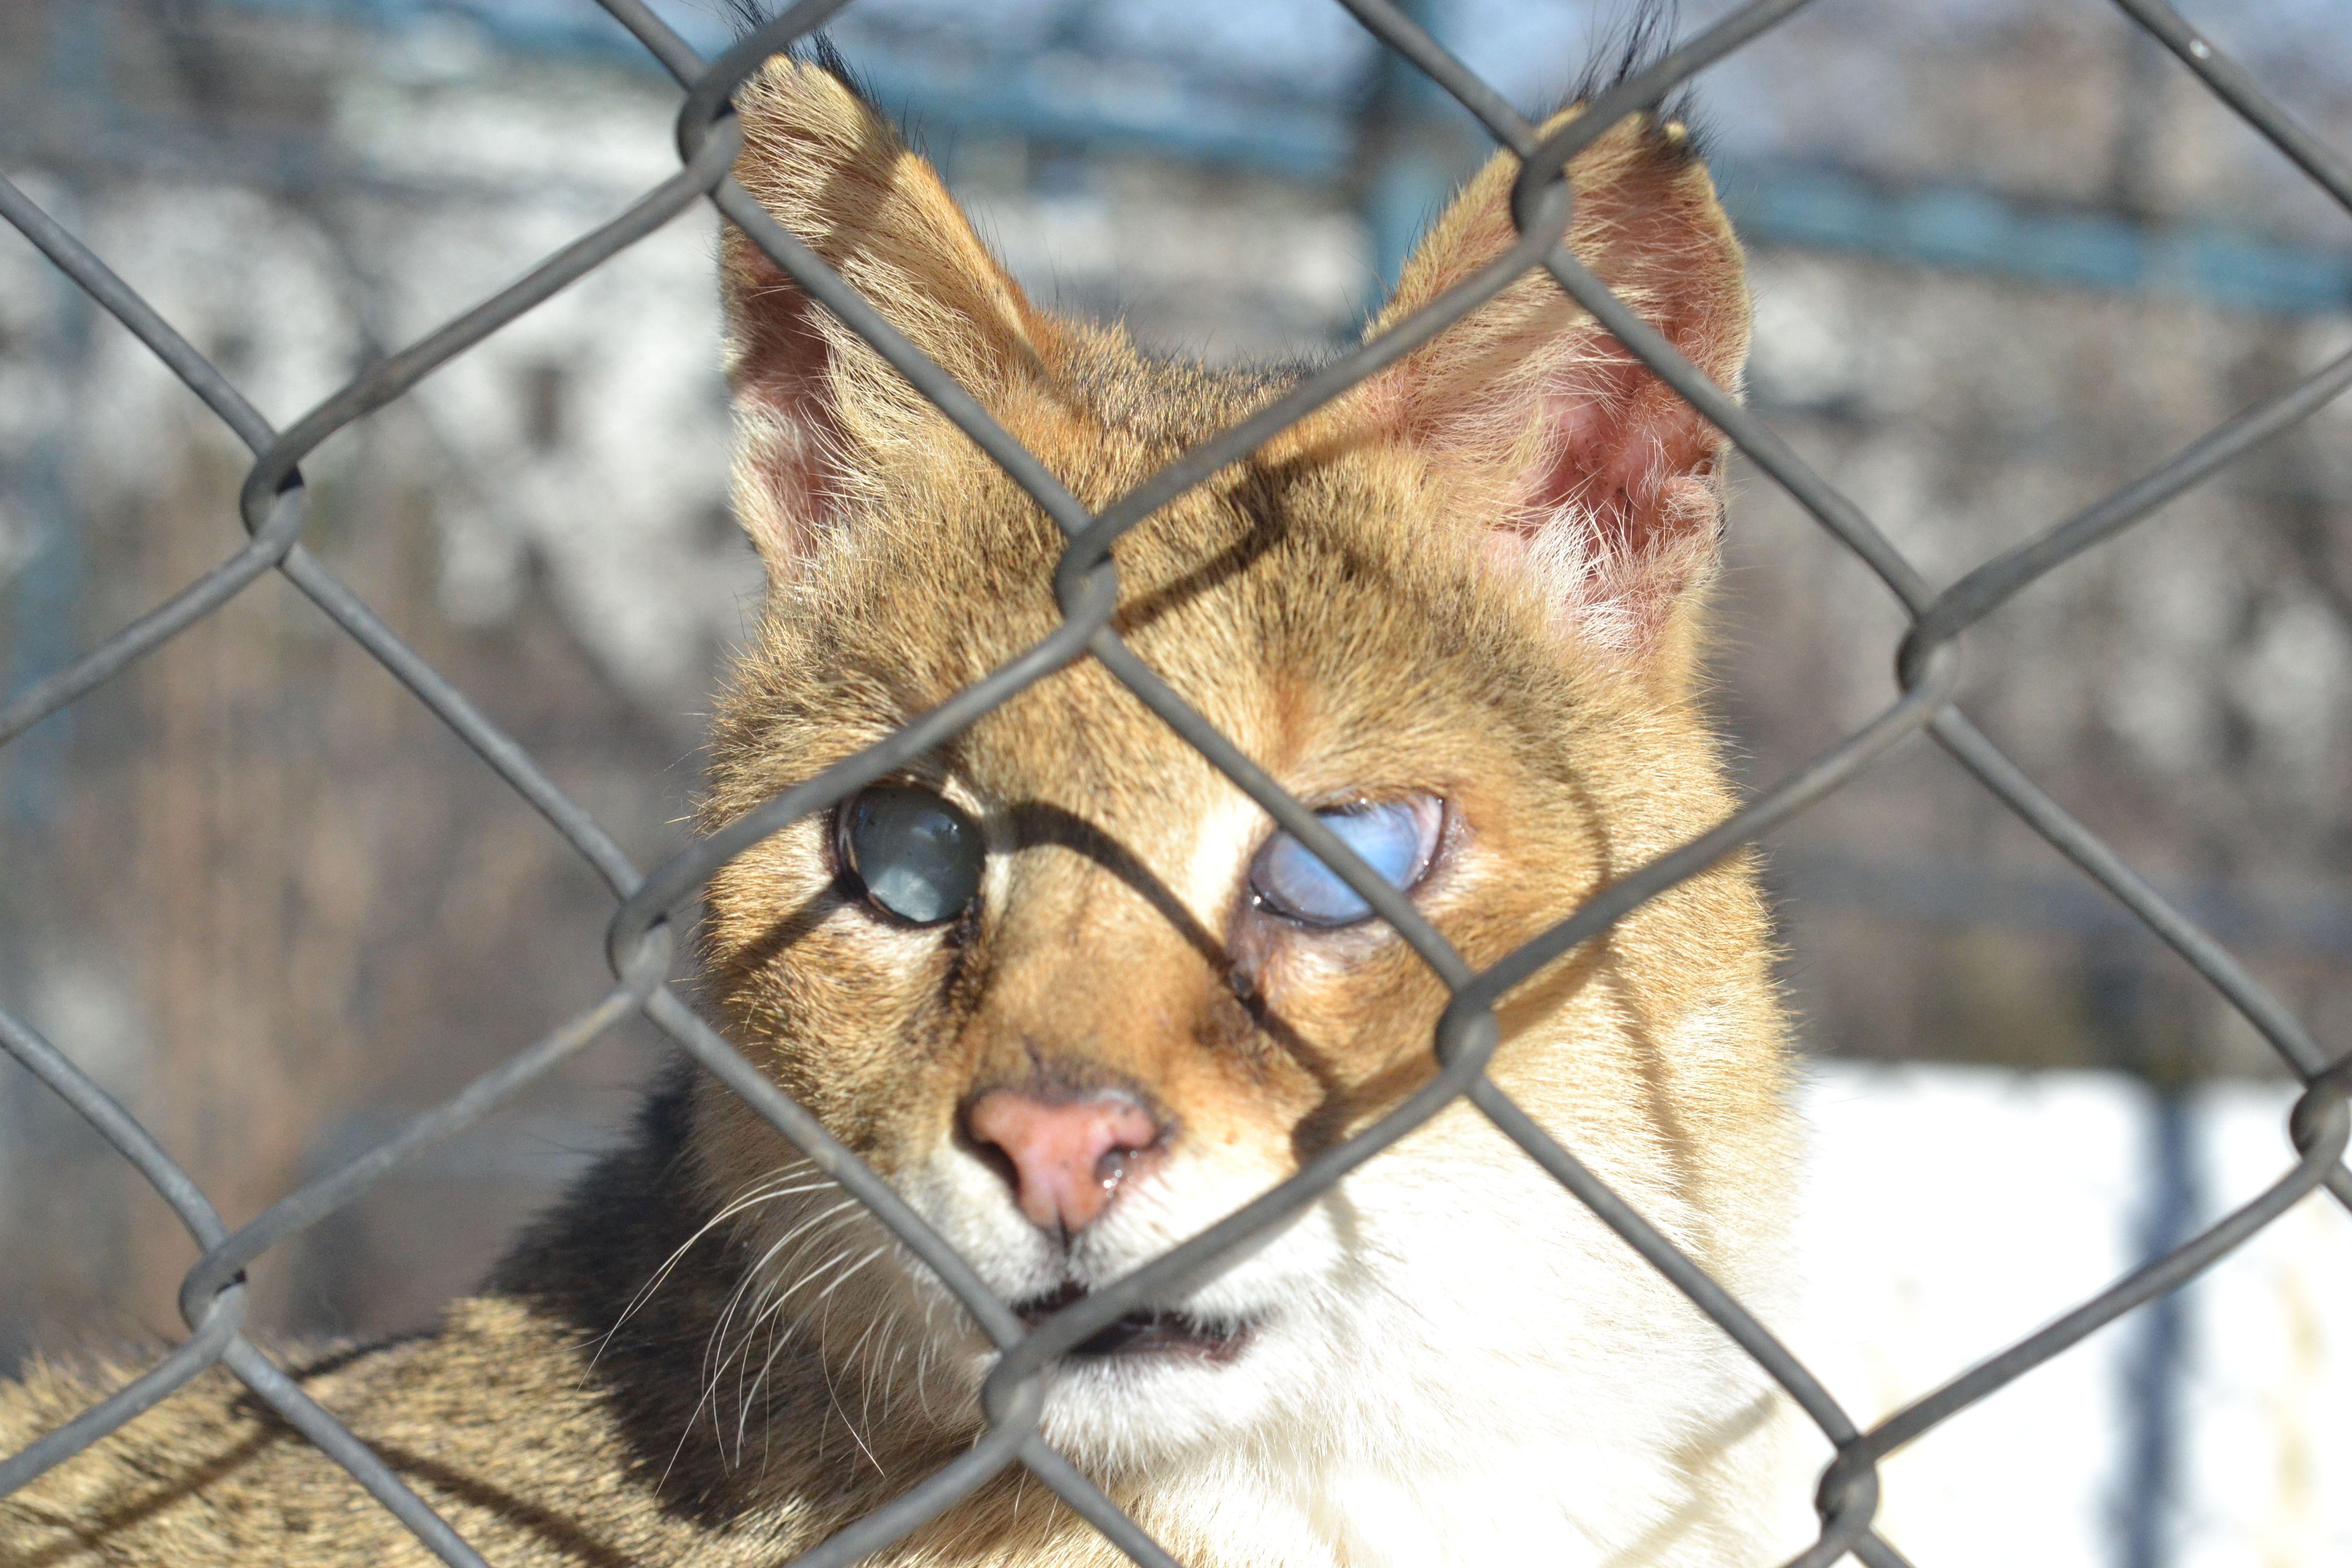 Beautiful Blind Cat in 2020 Cats, Beautiful blinds, Animals